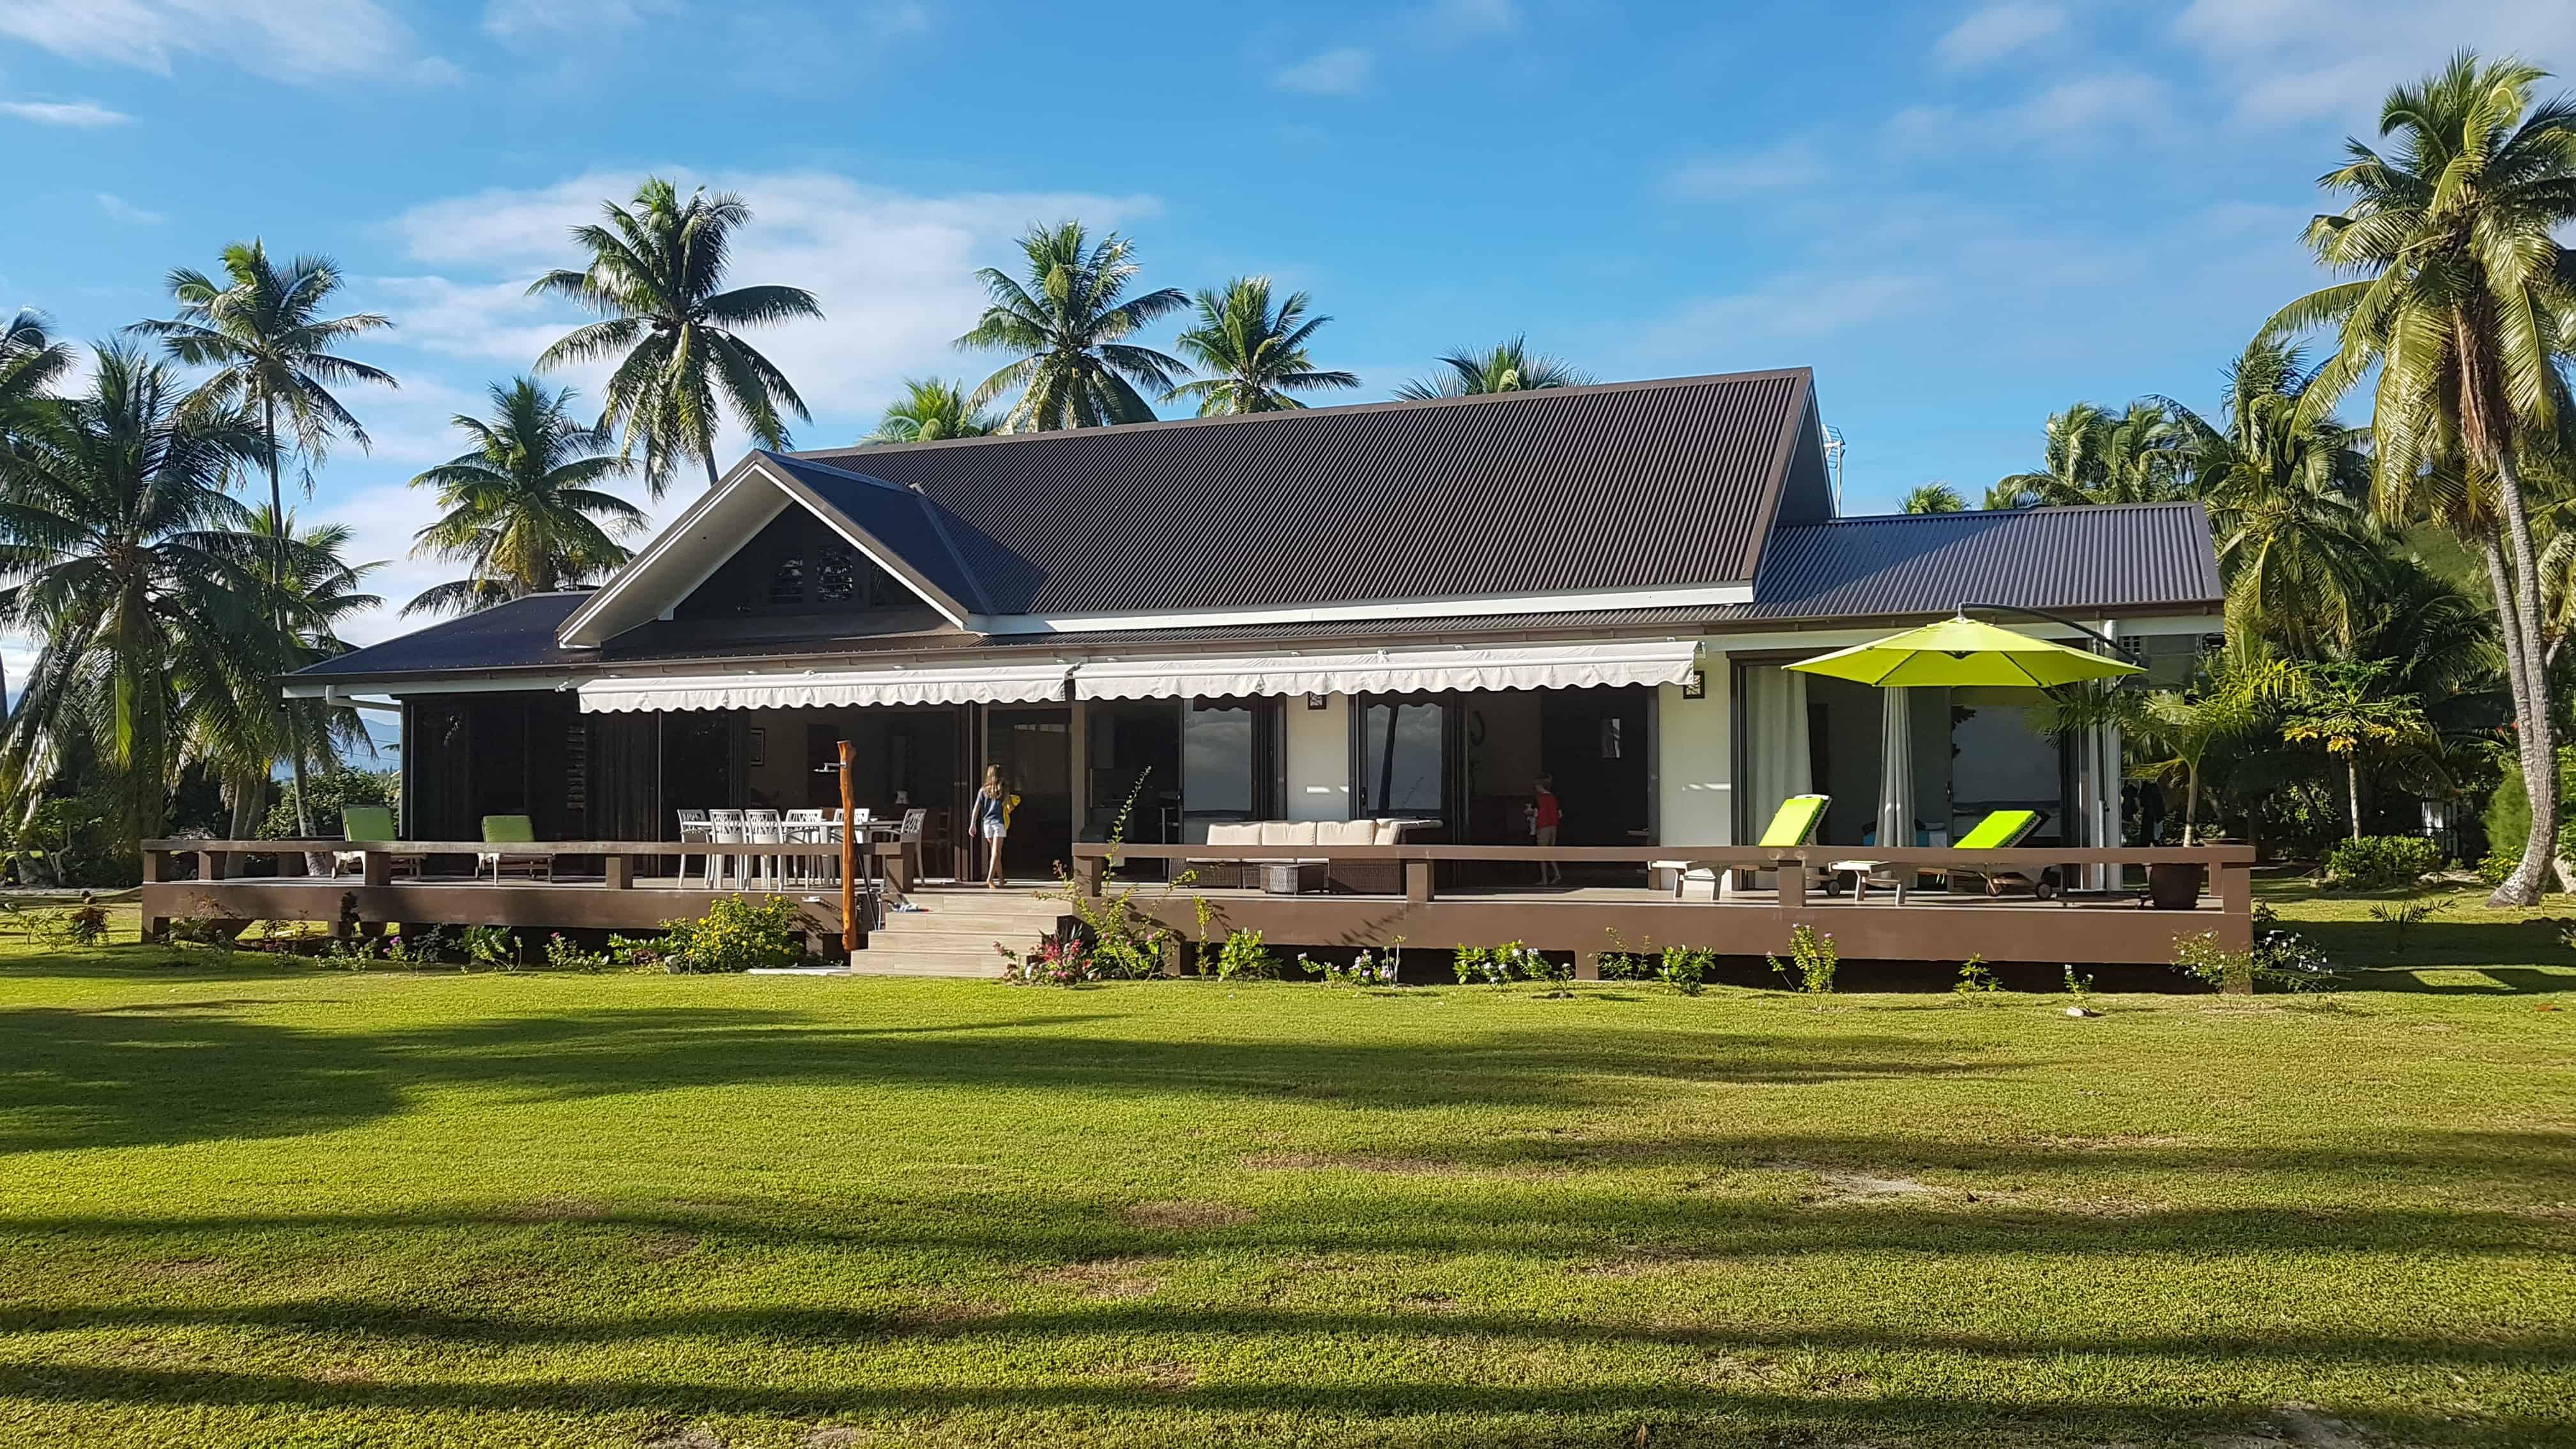 https://tahititourisme.jp/wp-content/uploads/2018/09/Villa-Tiarenui-by-Tahiti-Homes-®-a-Moorea-4.jpg